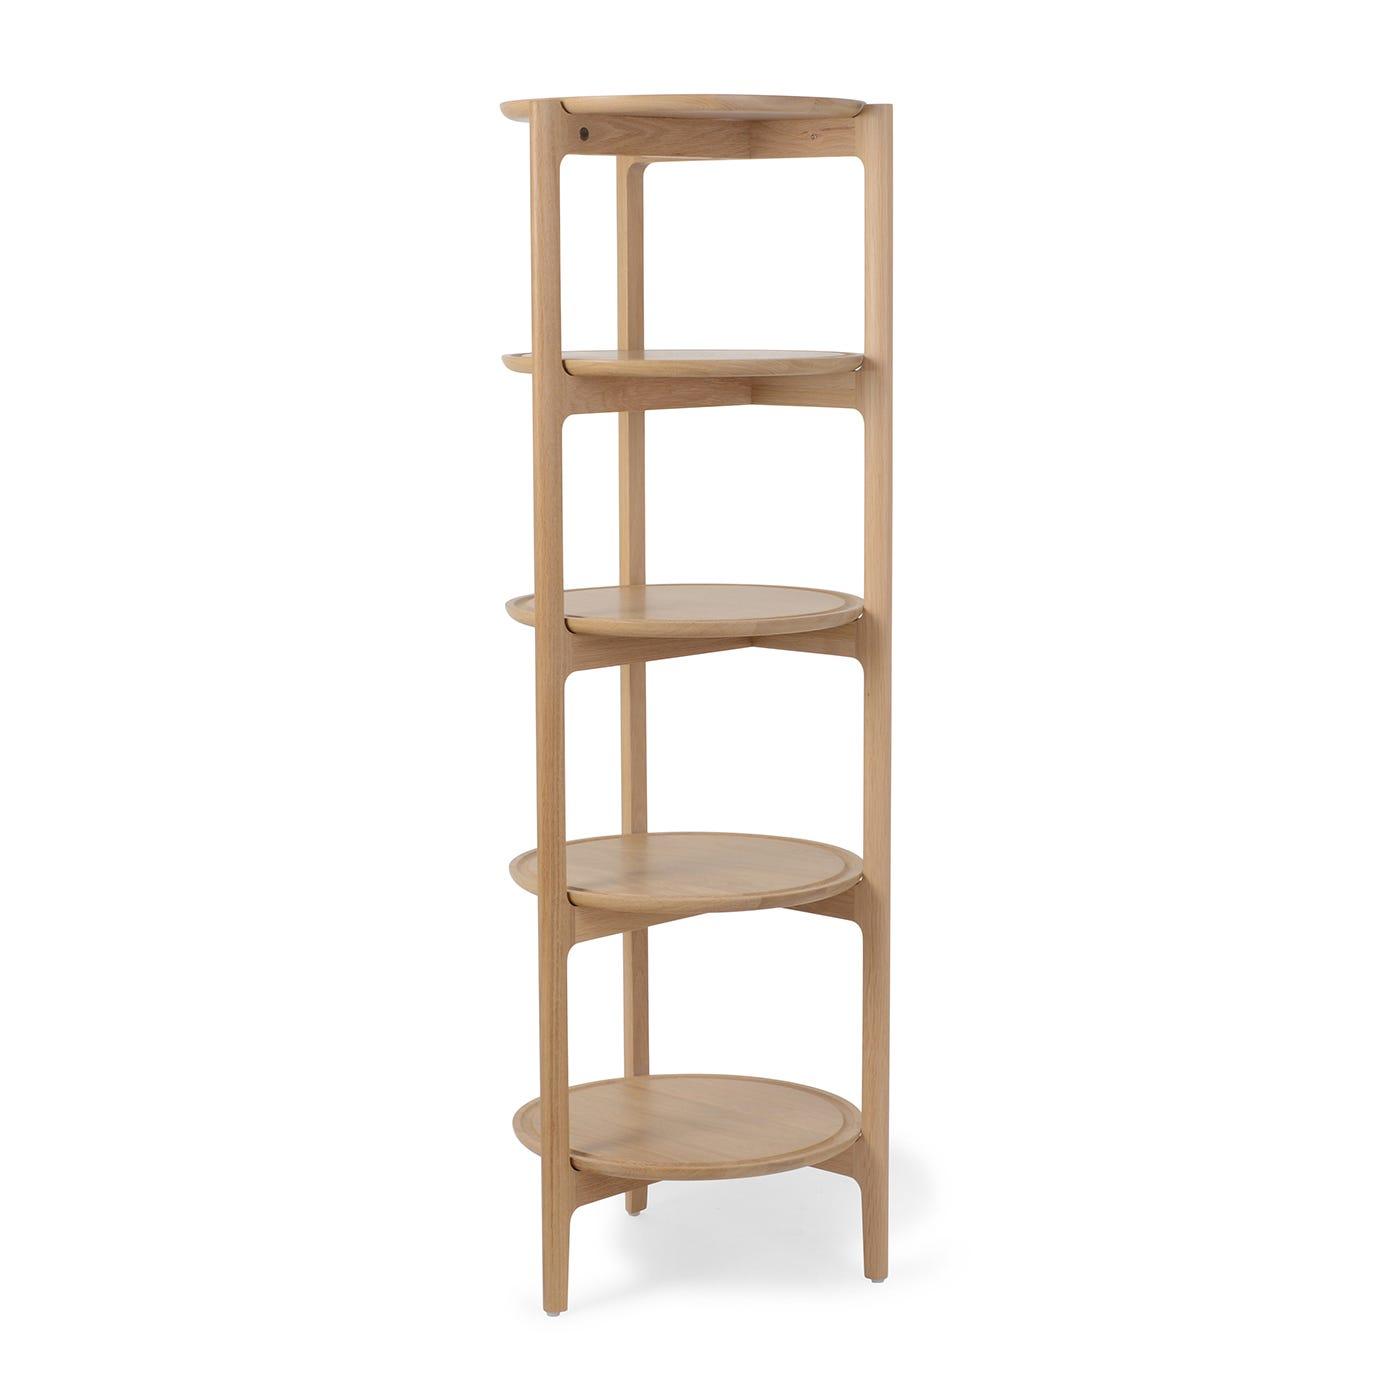 Very Ercol Svelto Tall Shelf | HEAL'S UP66